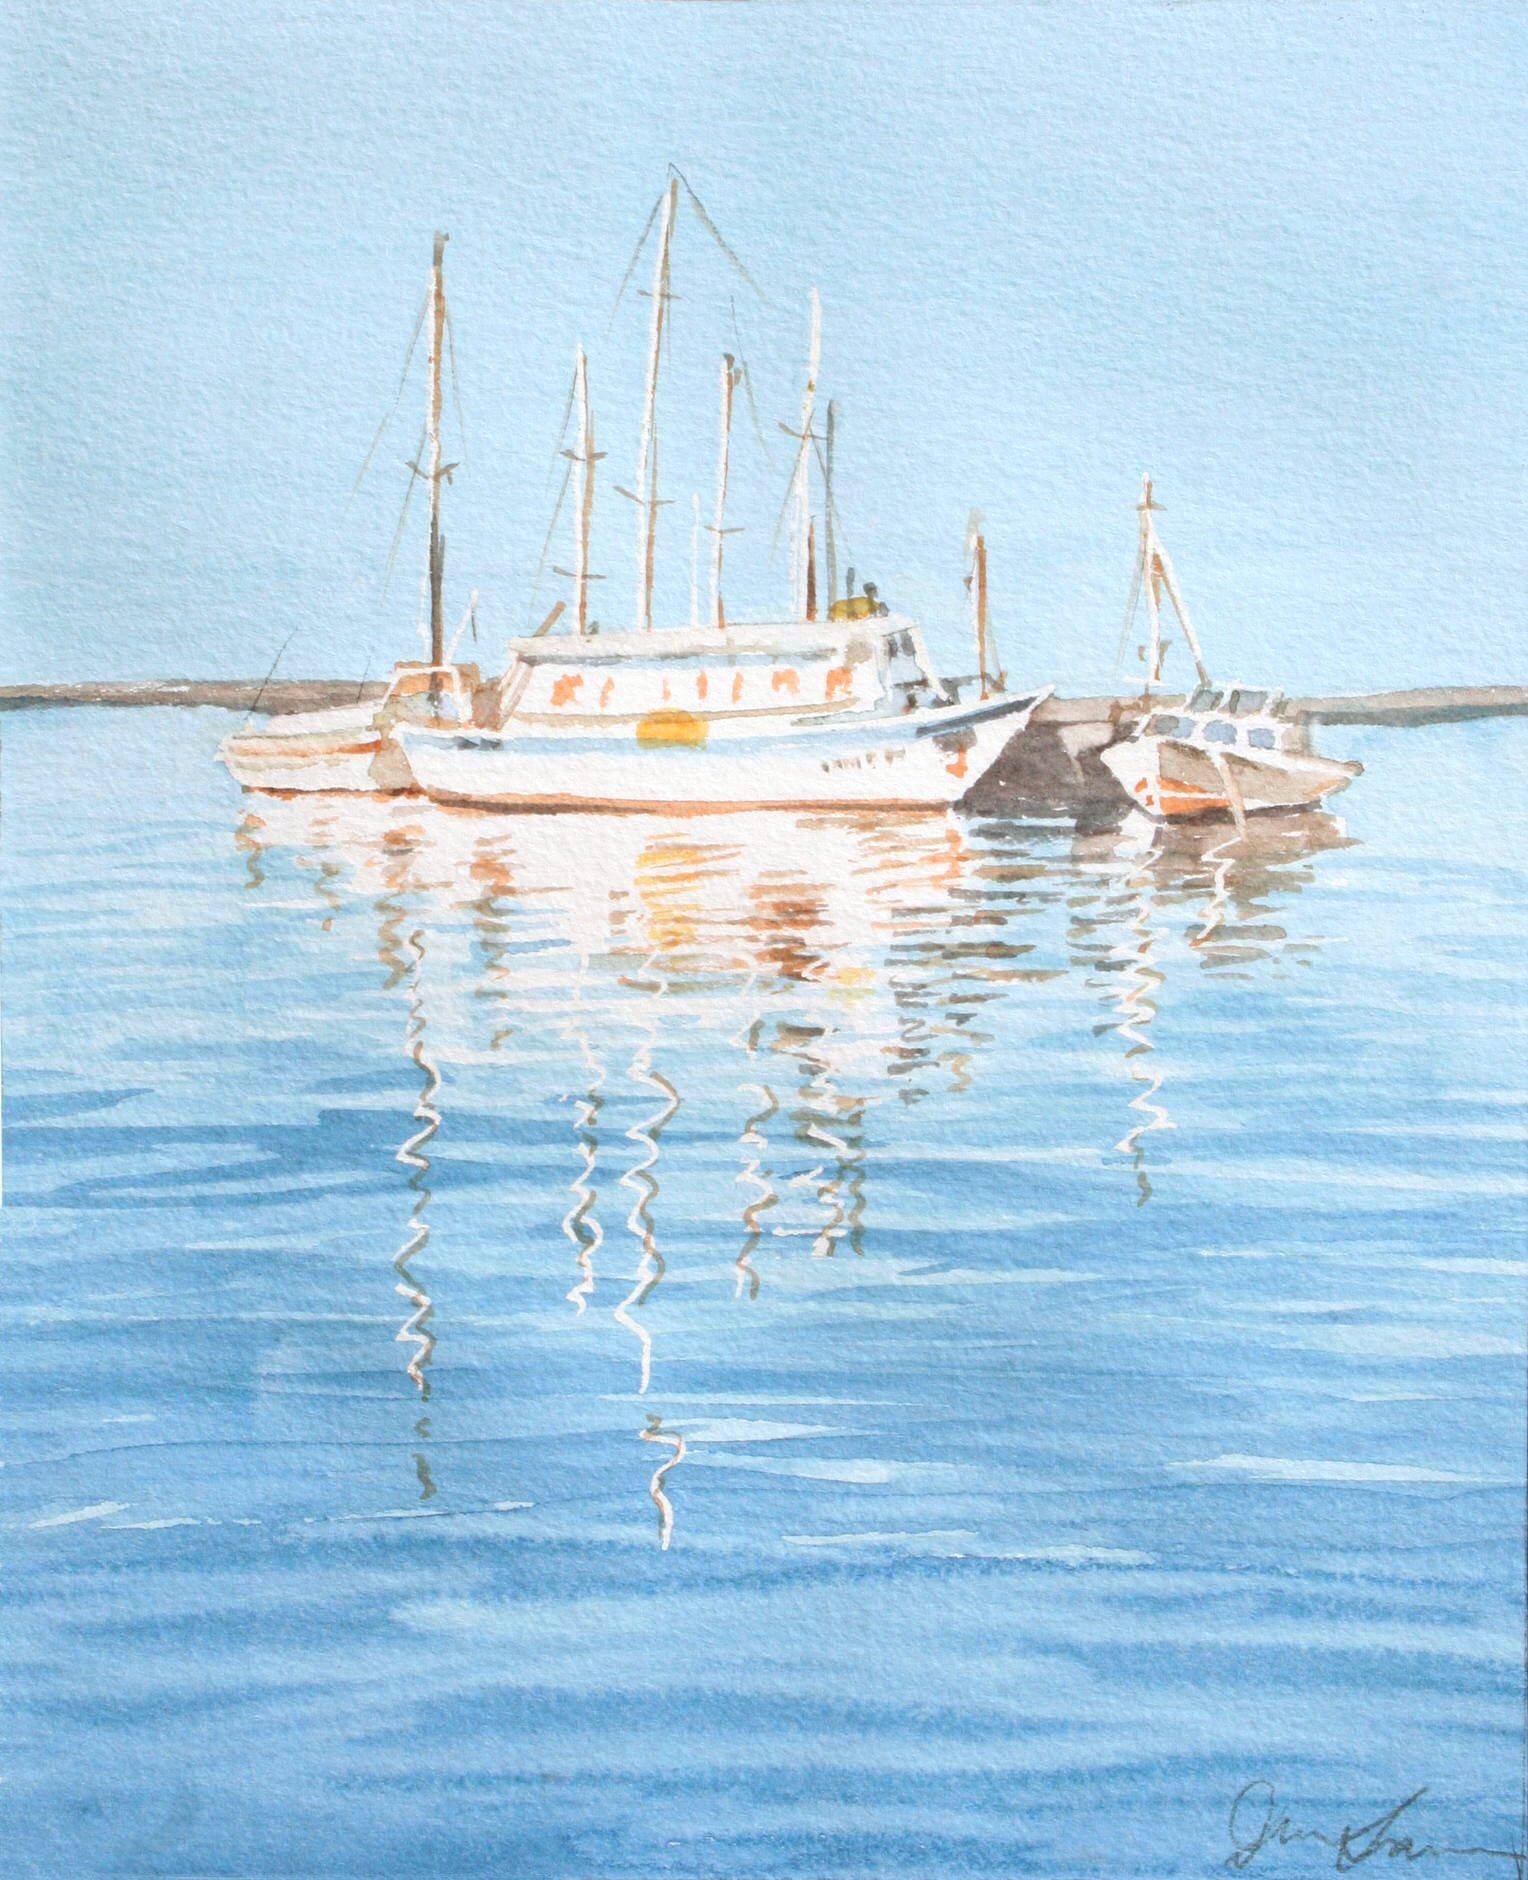 Boats - 19cmx24cm